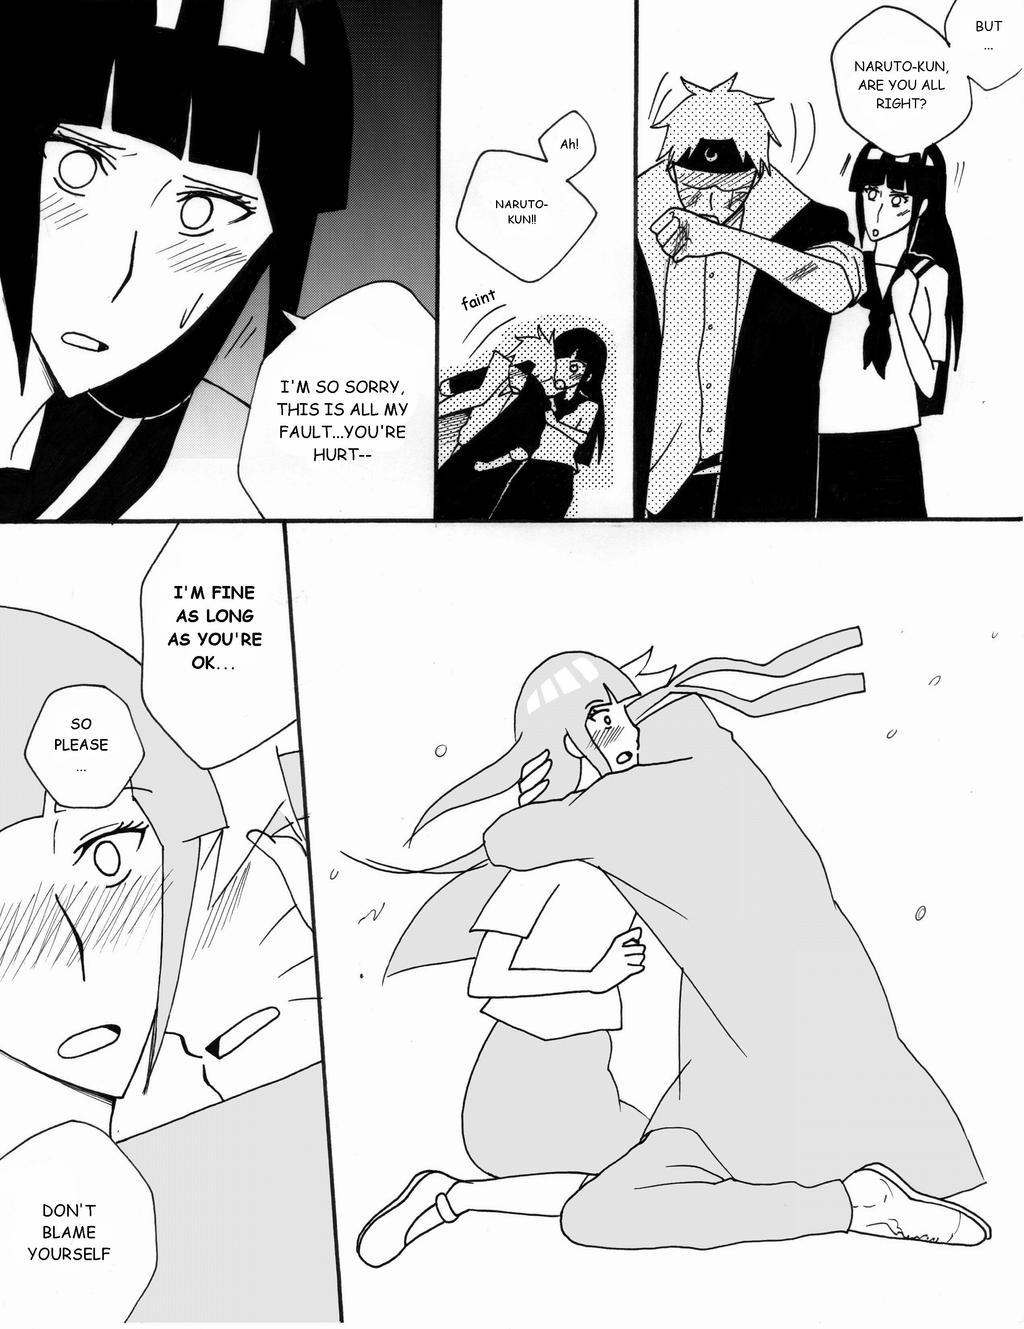 AT Doujin: Chapter05-Page16 by Diasu